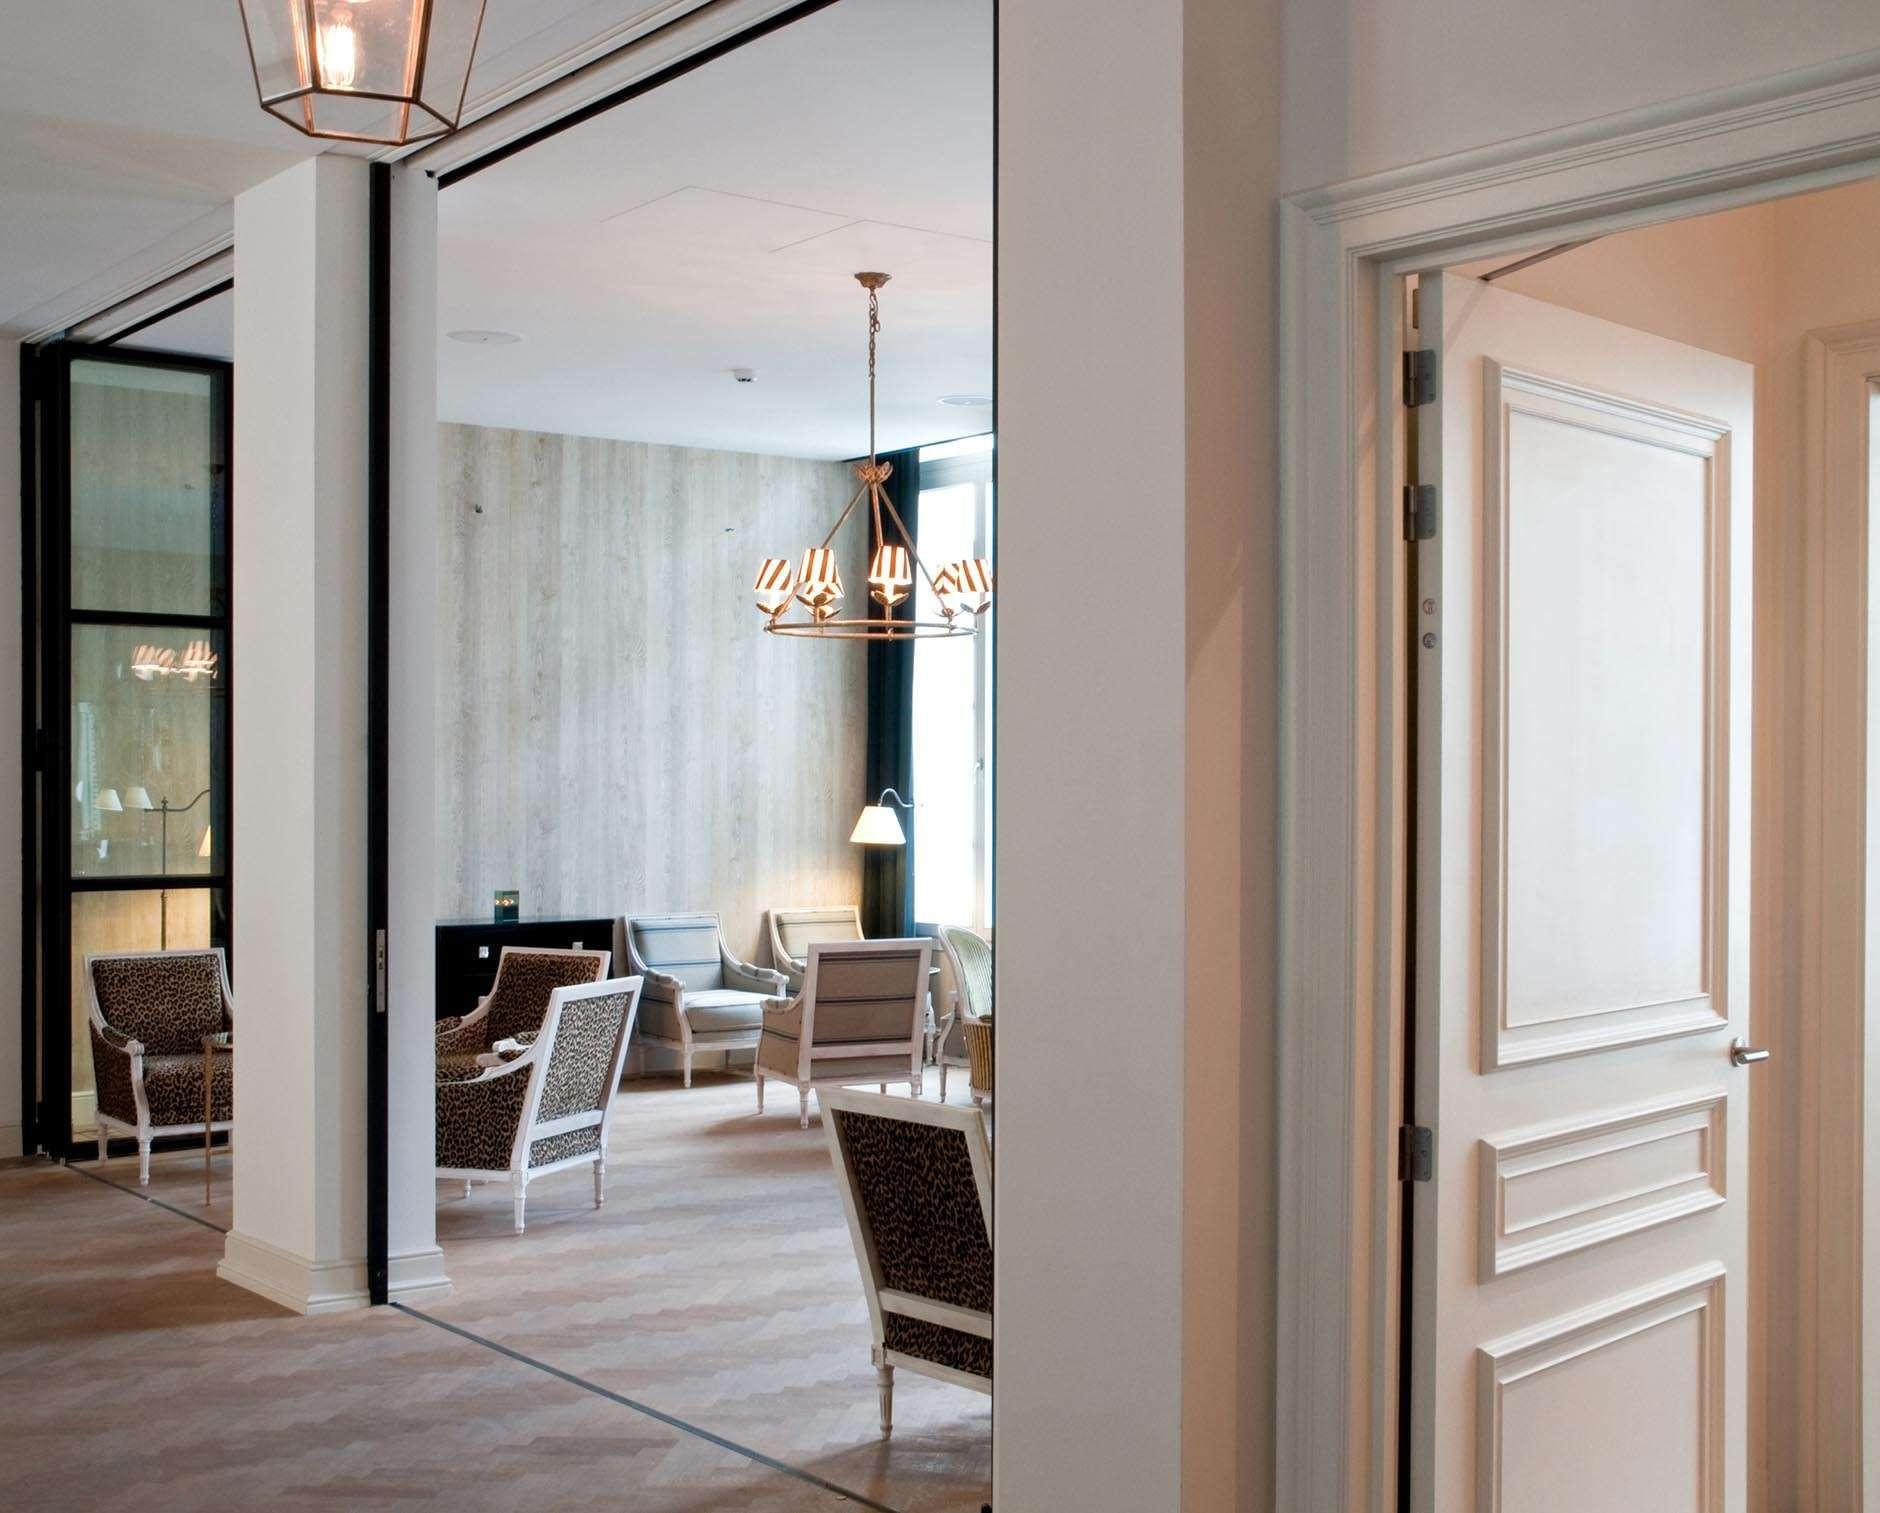 Nordex_Hotel Reylof_6